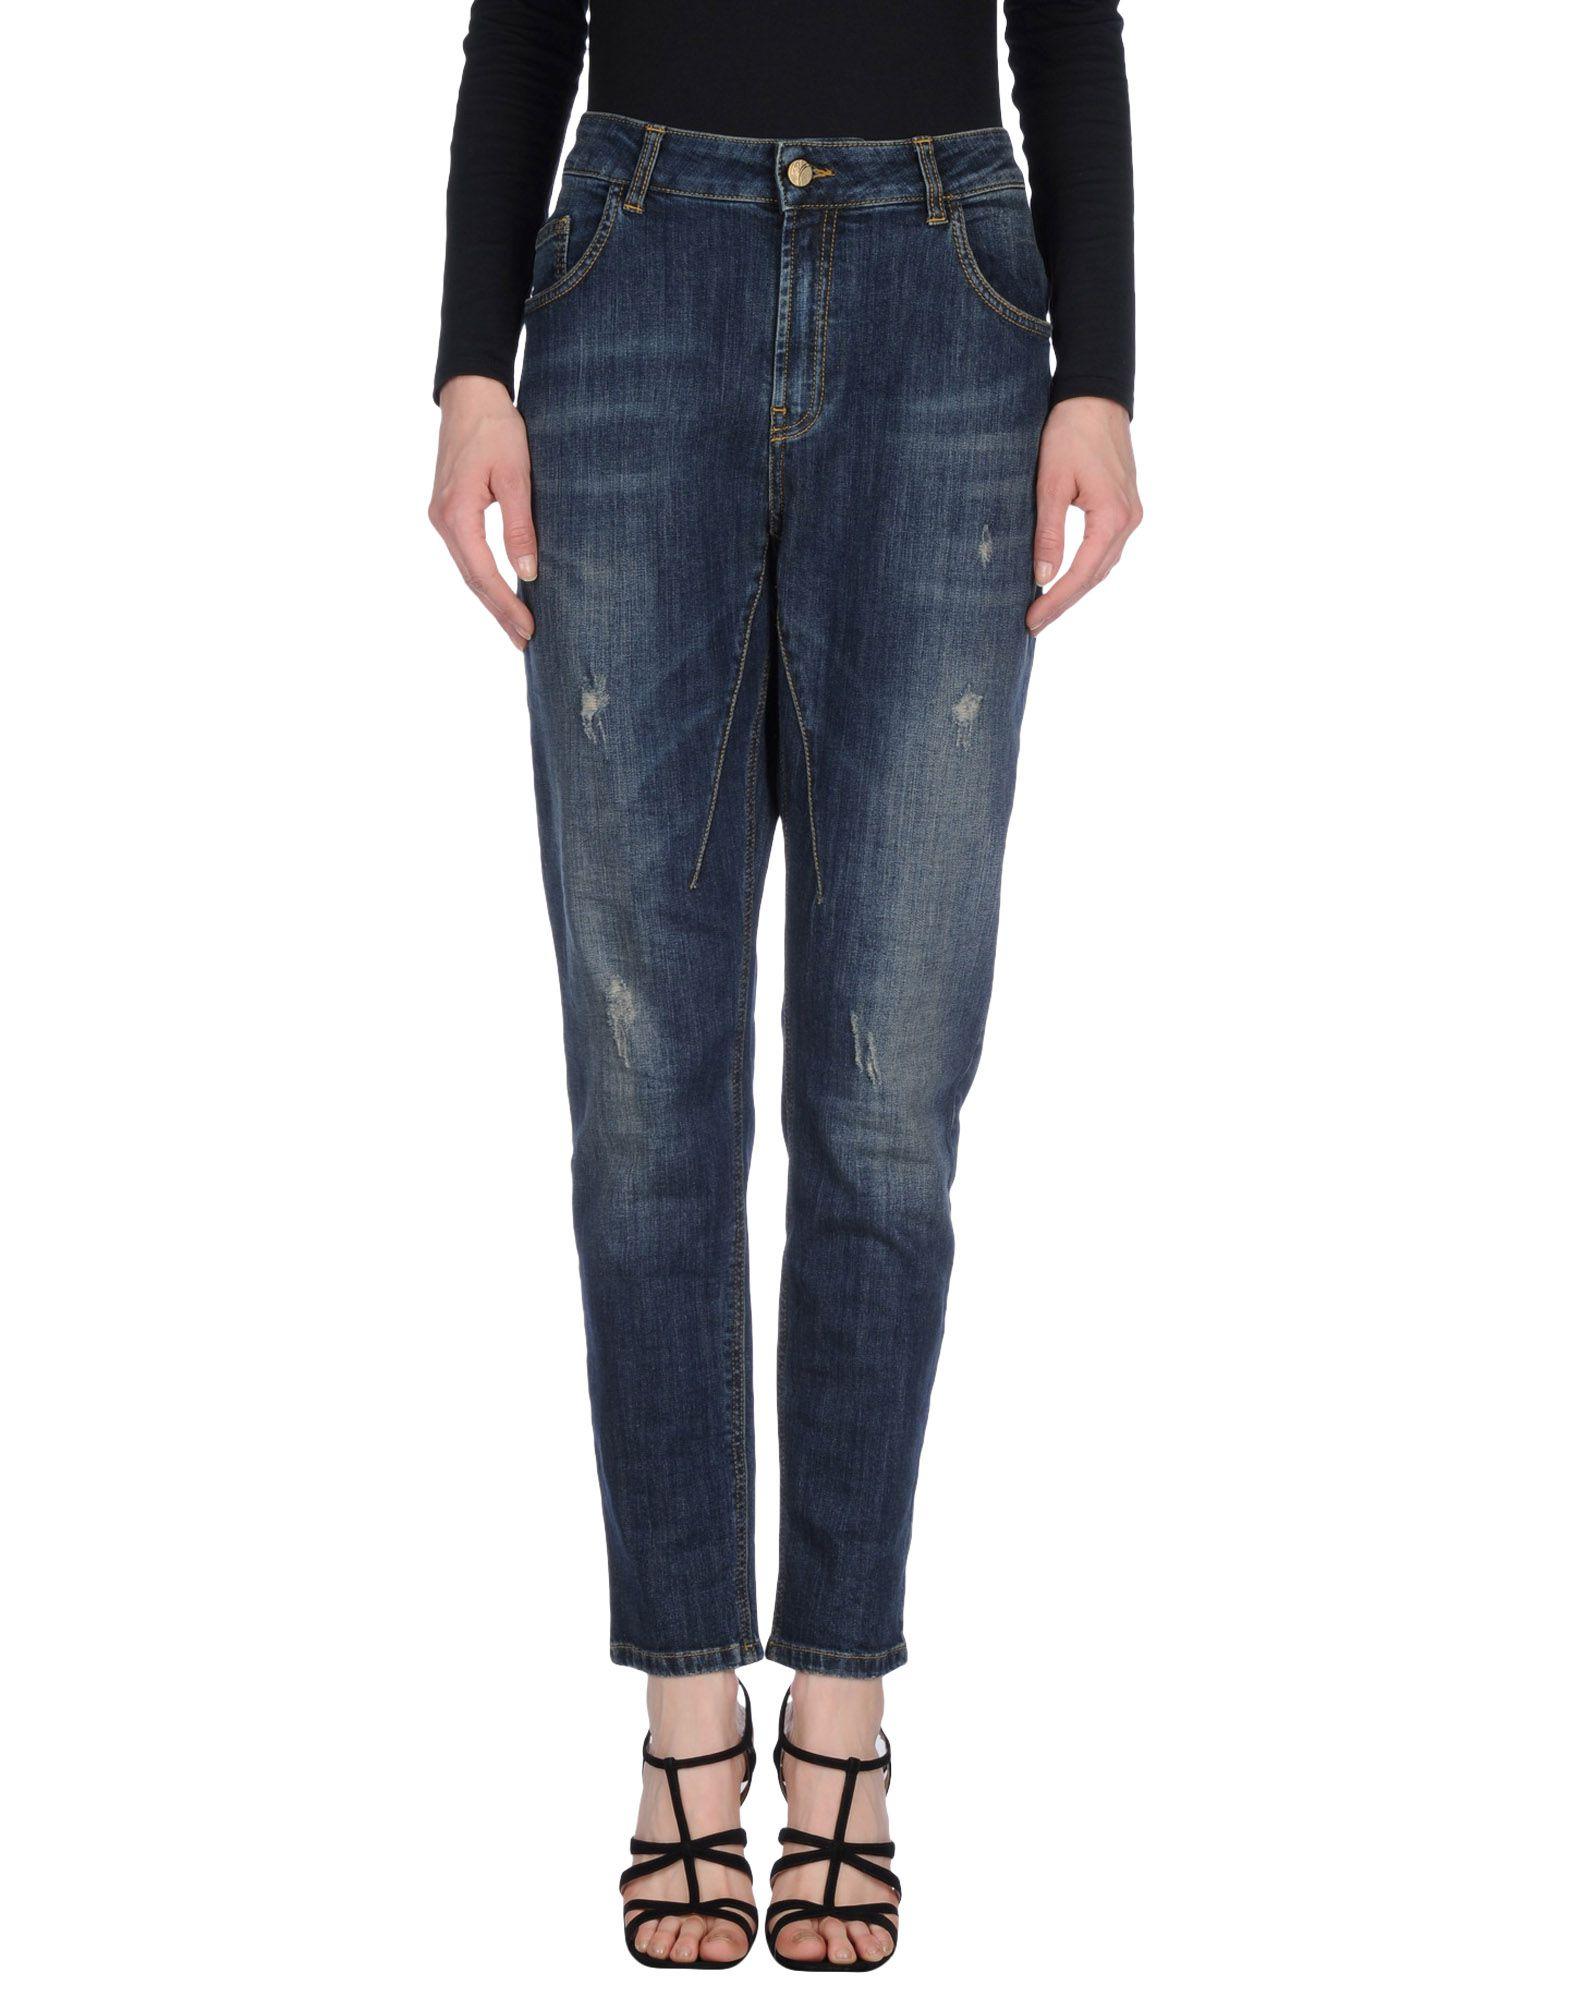 Pantaloni Jeans Manila Grace Denim Donna - Acquista online su